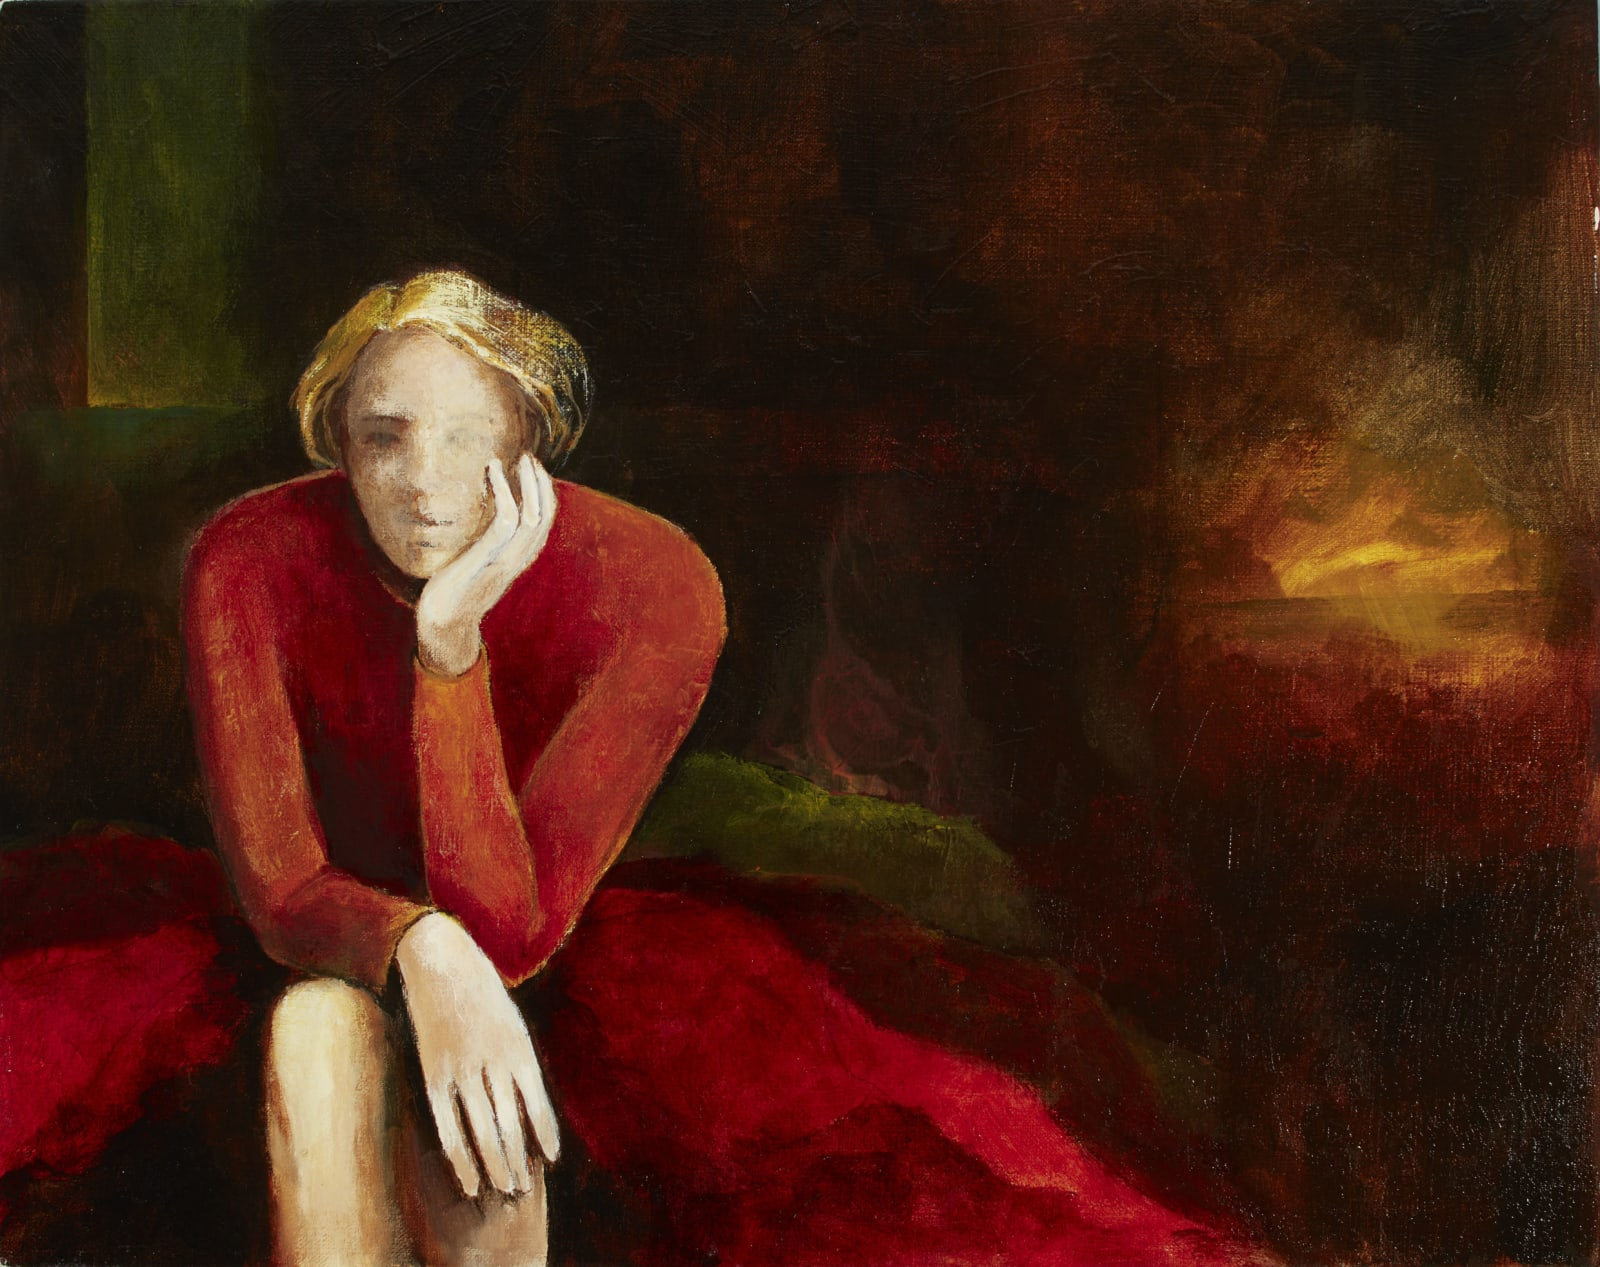 Margaret Egan, Listening to the World